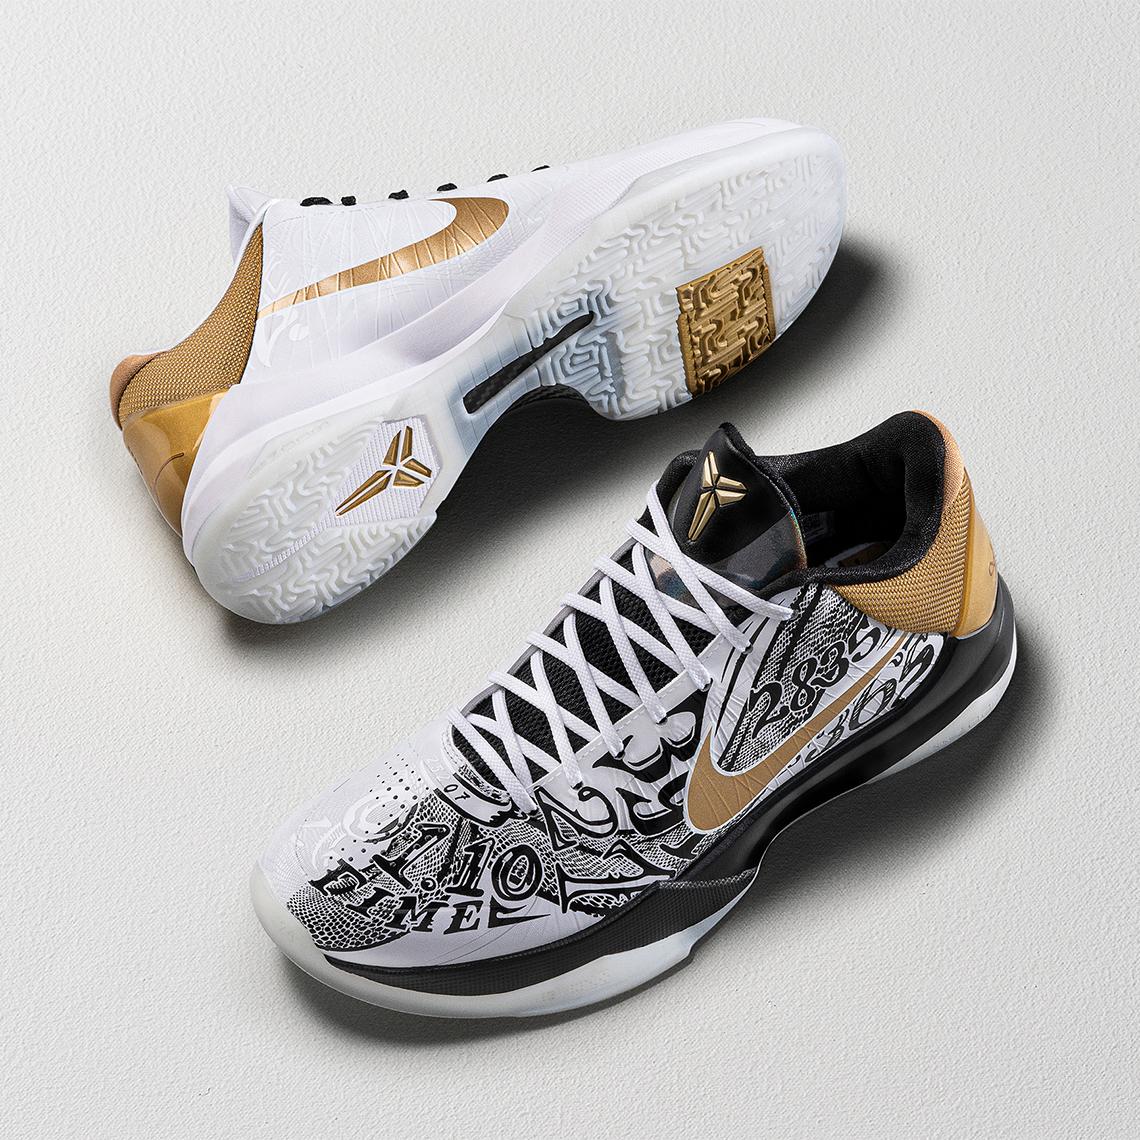 Nike Kobe 5 Big Stage Protro - Release